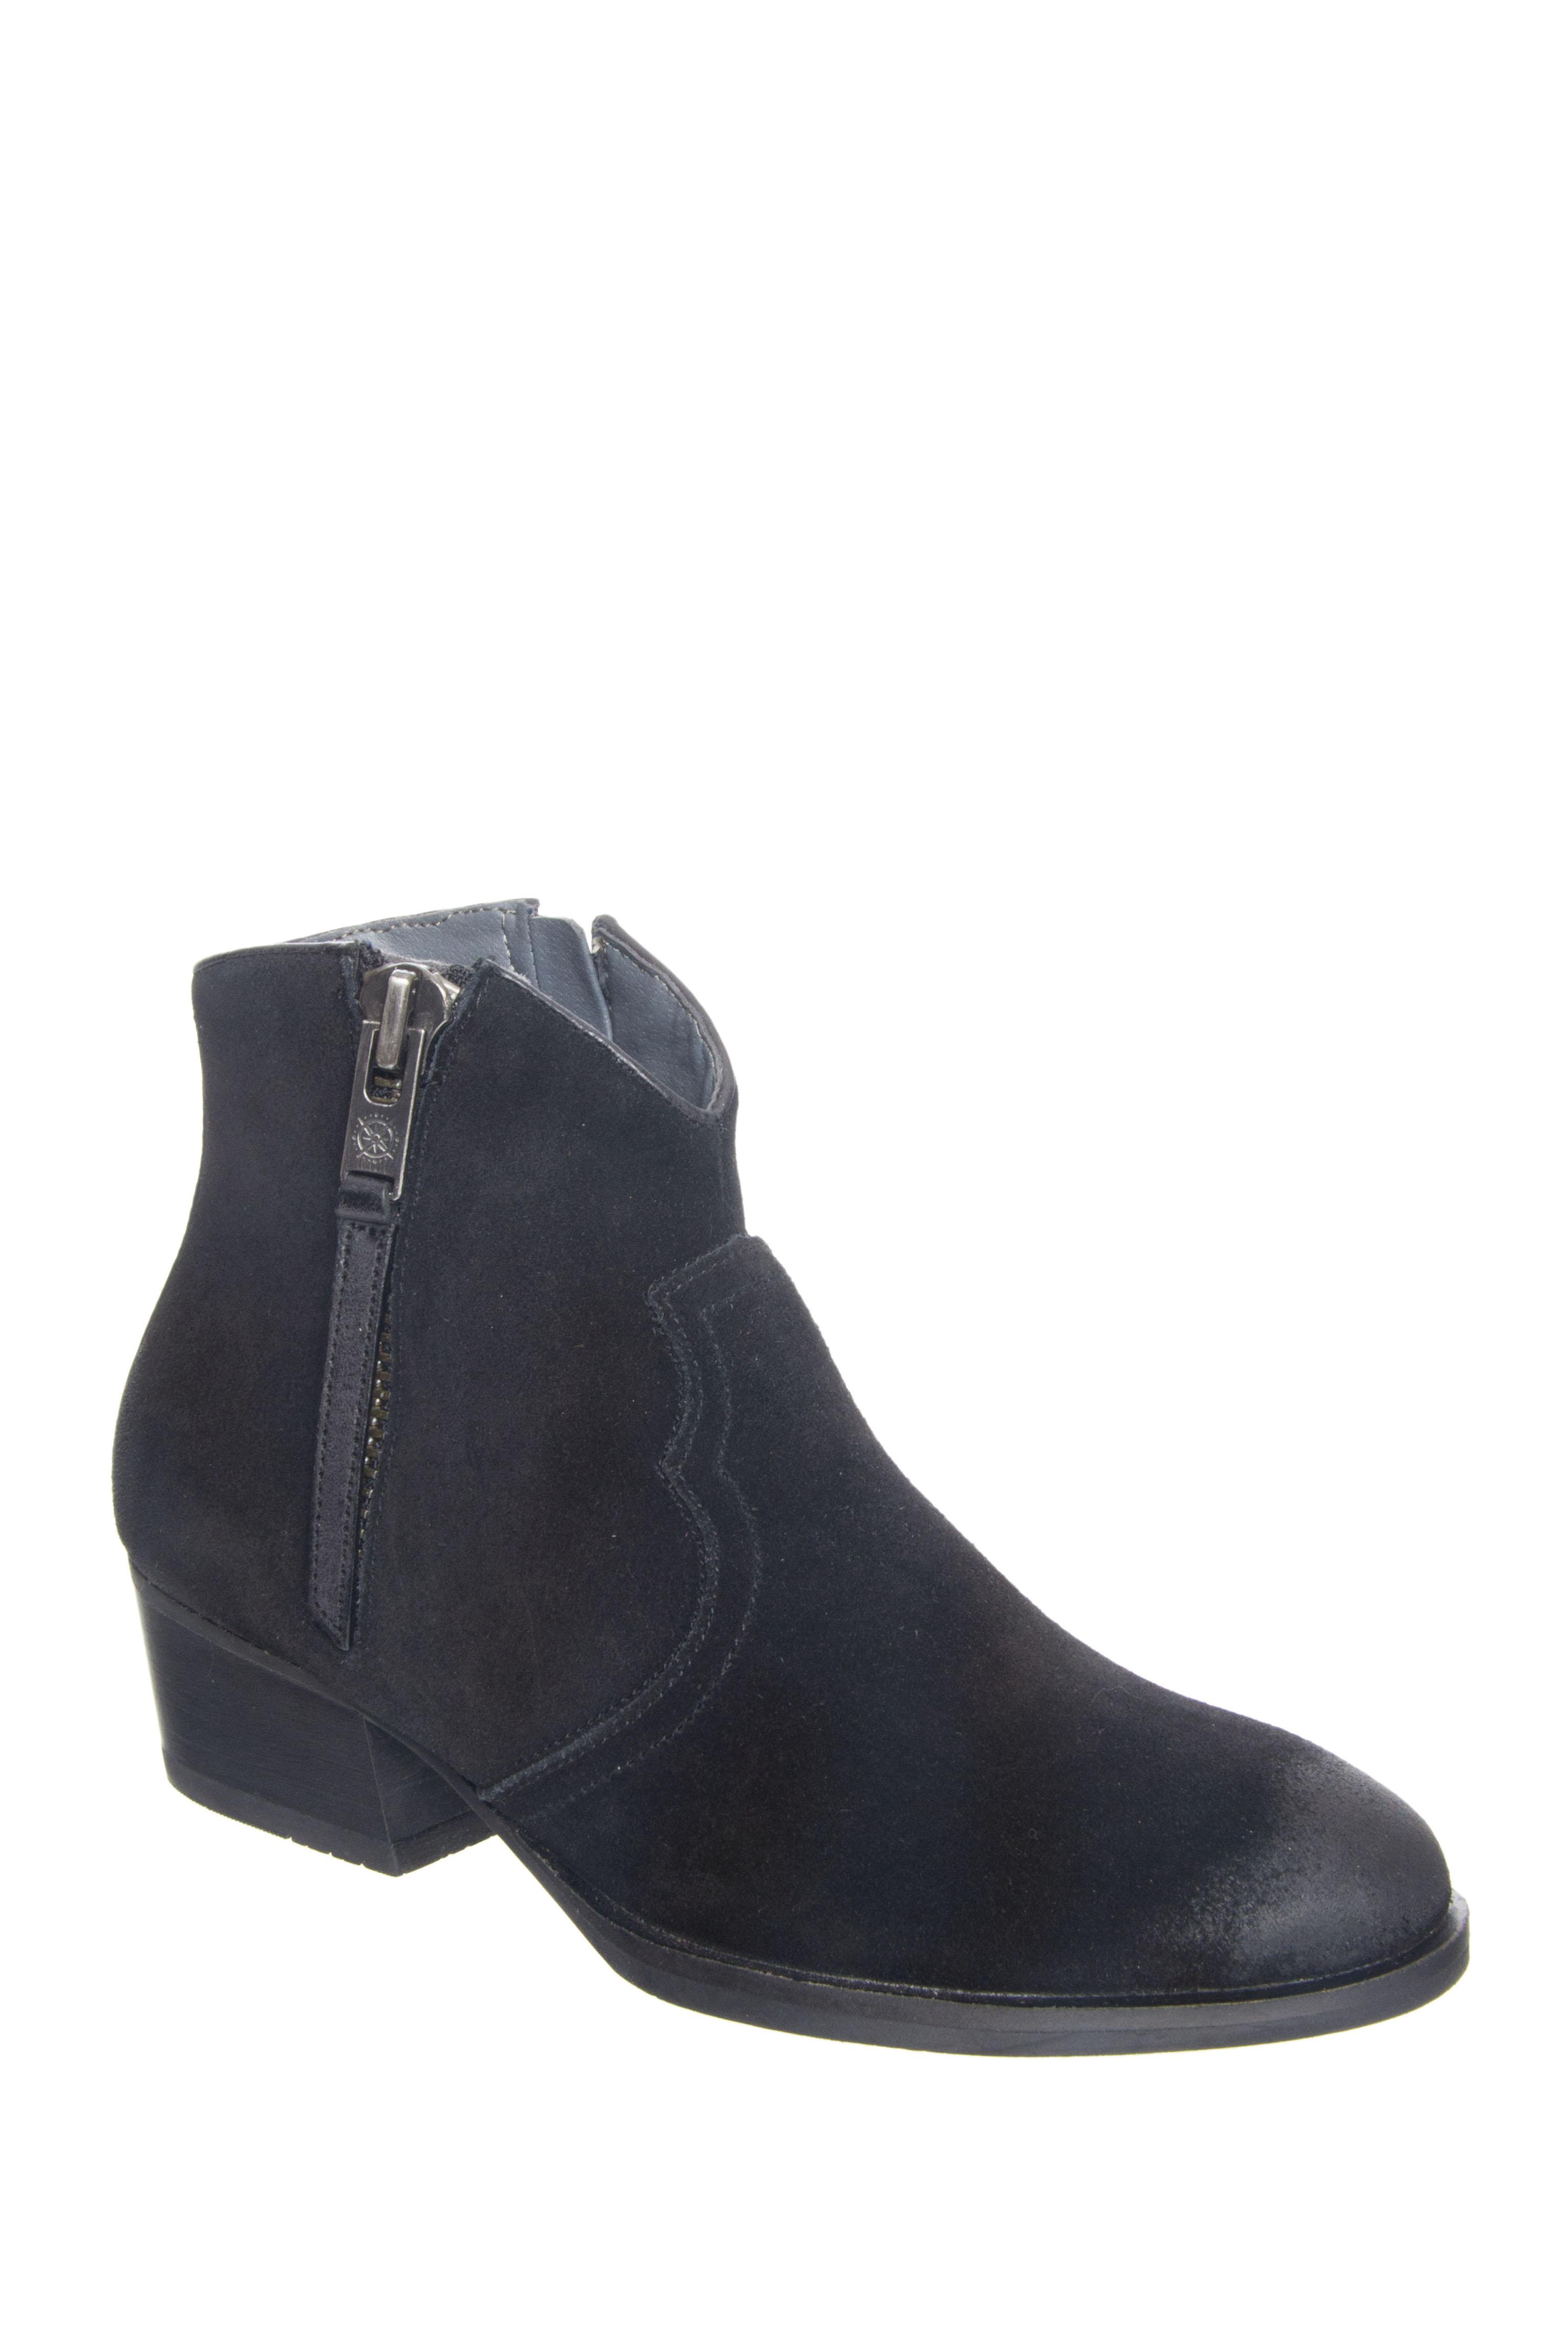 Bussola Annie Mid Heel Booties - Black Suede